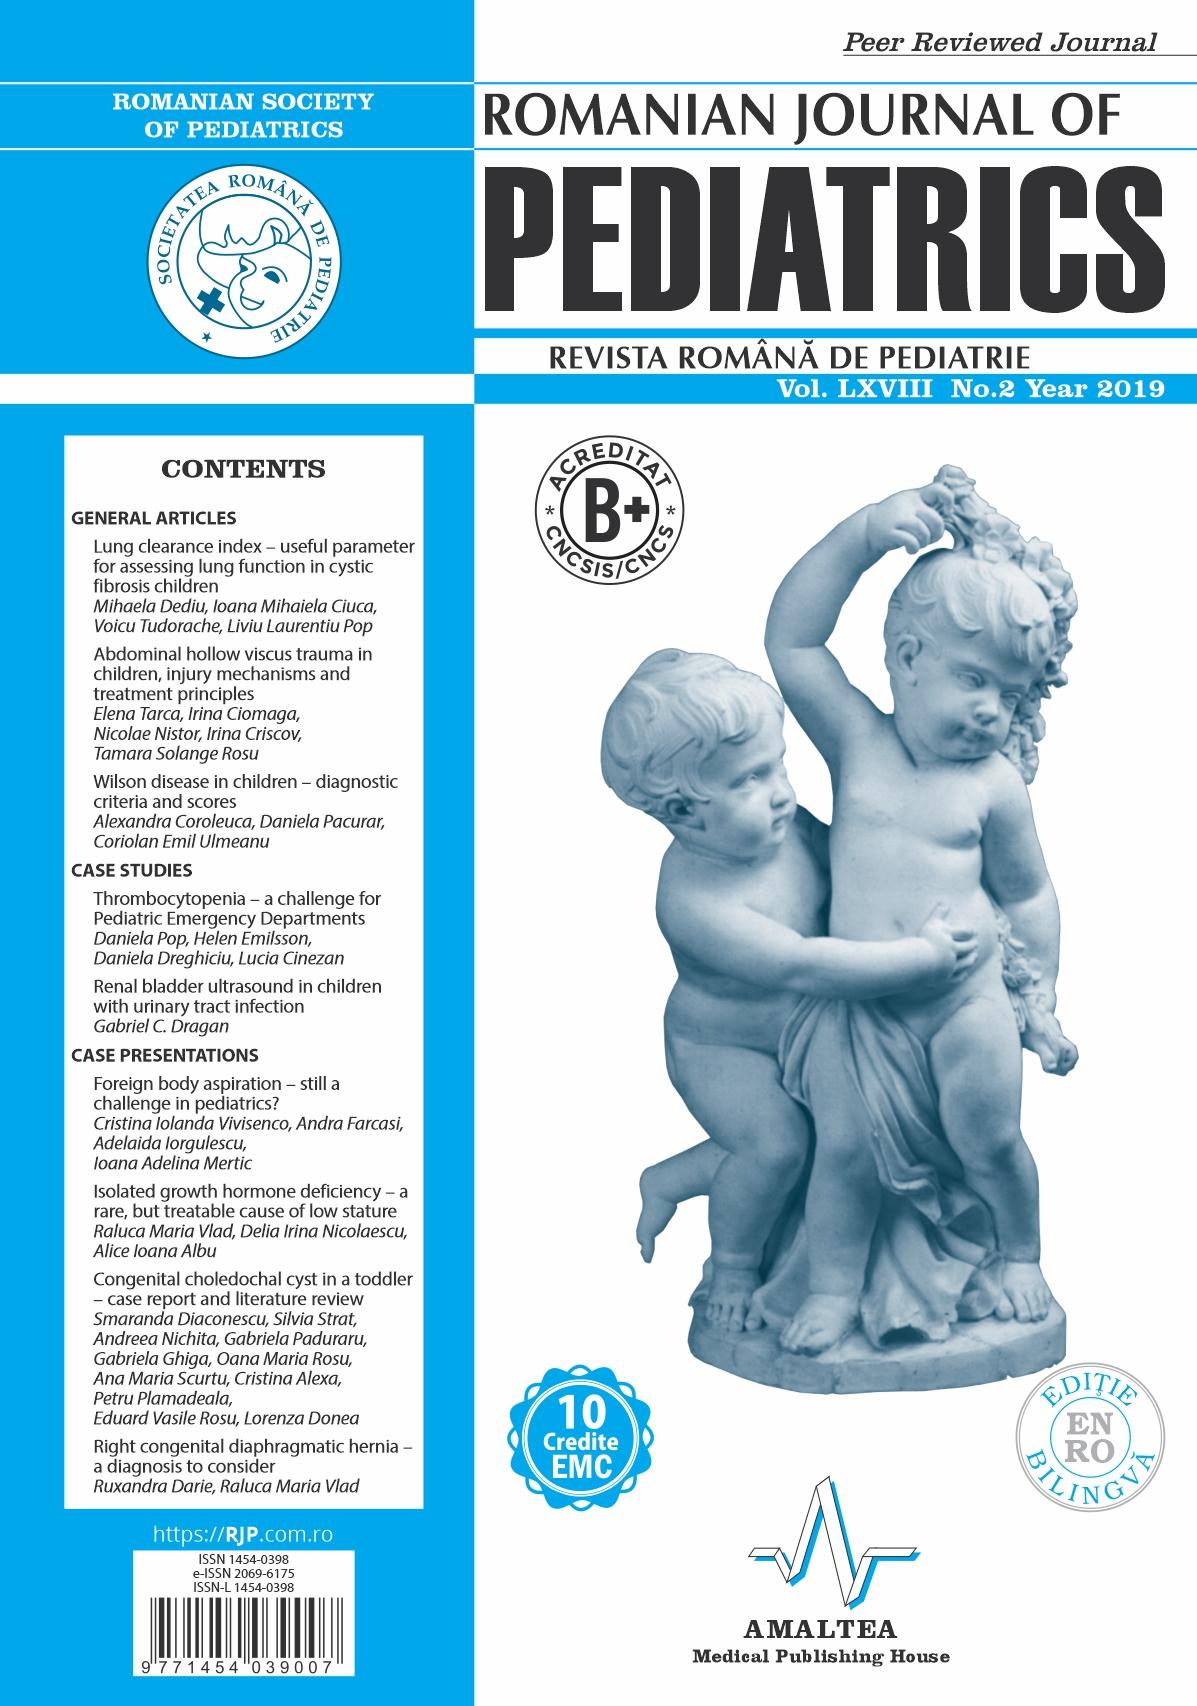 Romanian Journal of Pediatrics   Volume LXVIII, No. 2, Year 2019